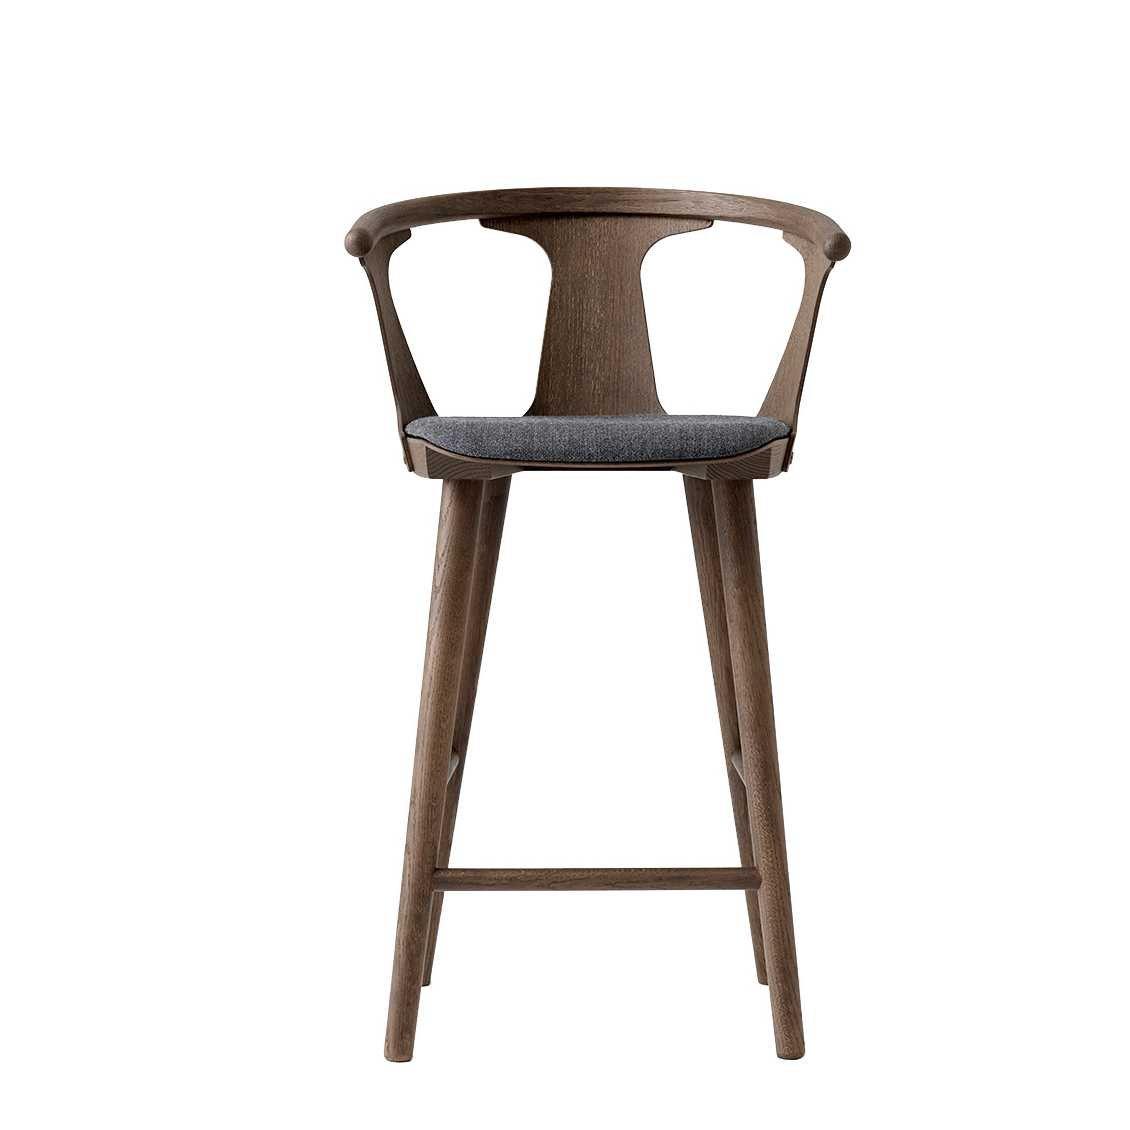 https://www.fundesign.nl/media/catalog/product/i/n/in-between-barstoel-brown-sk8_3.jpg